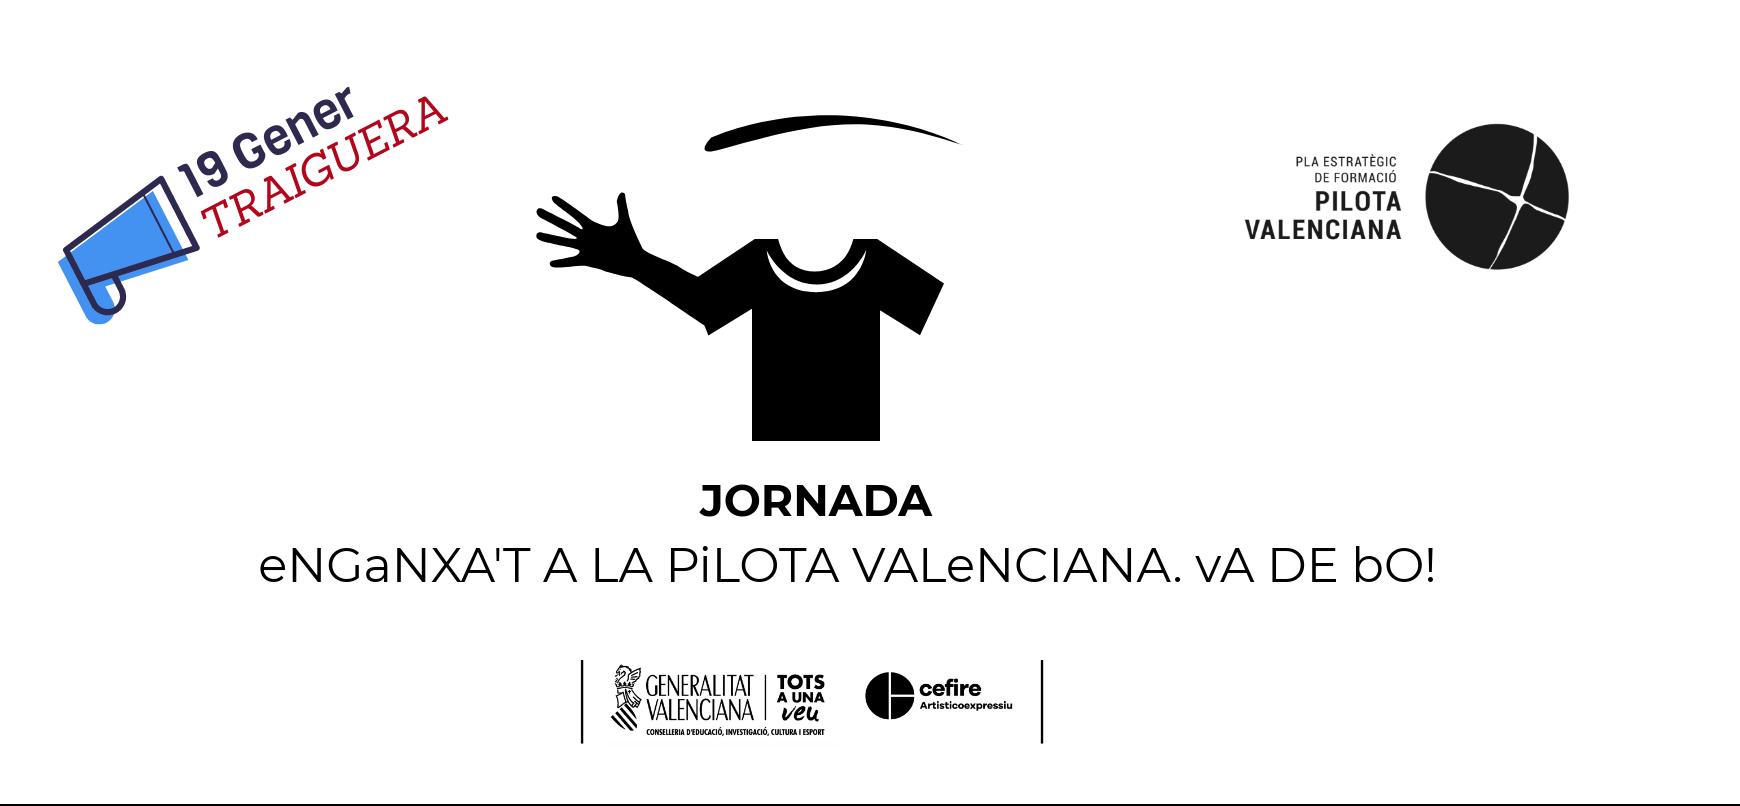 logo_jornada_pilota_traiguera